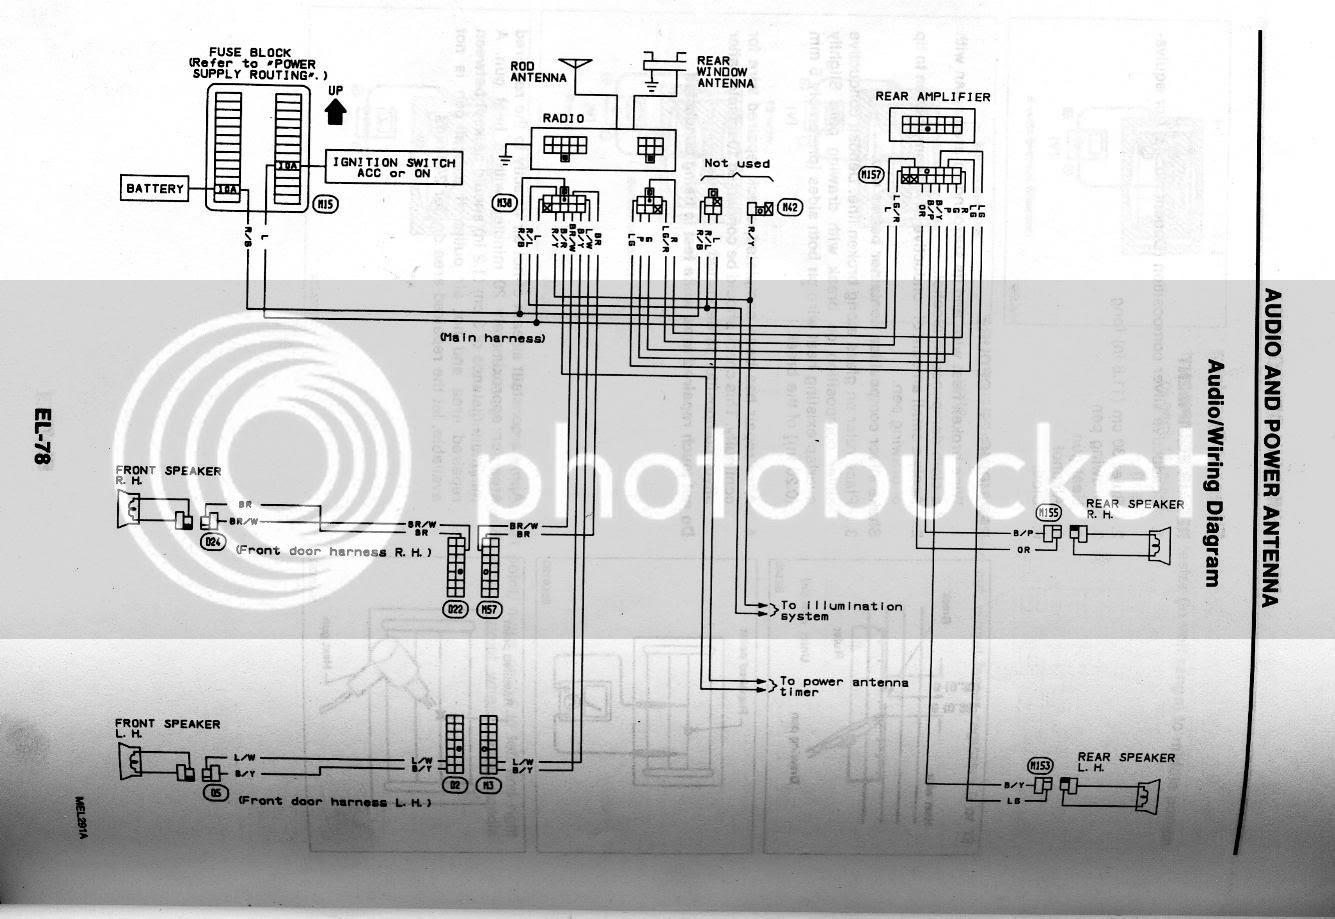 Diagram Superwinch 92 520000 Wiring Diagram Full Version Hd Quality Wiring Diagram Diagramink Karma Pa It